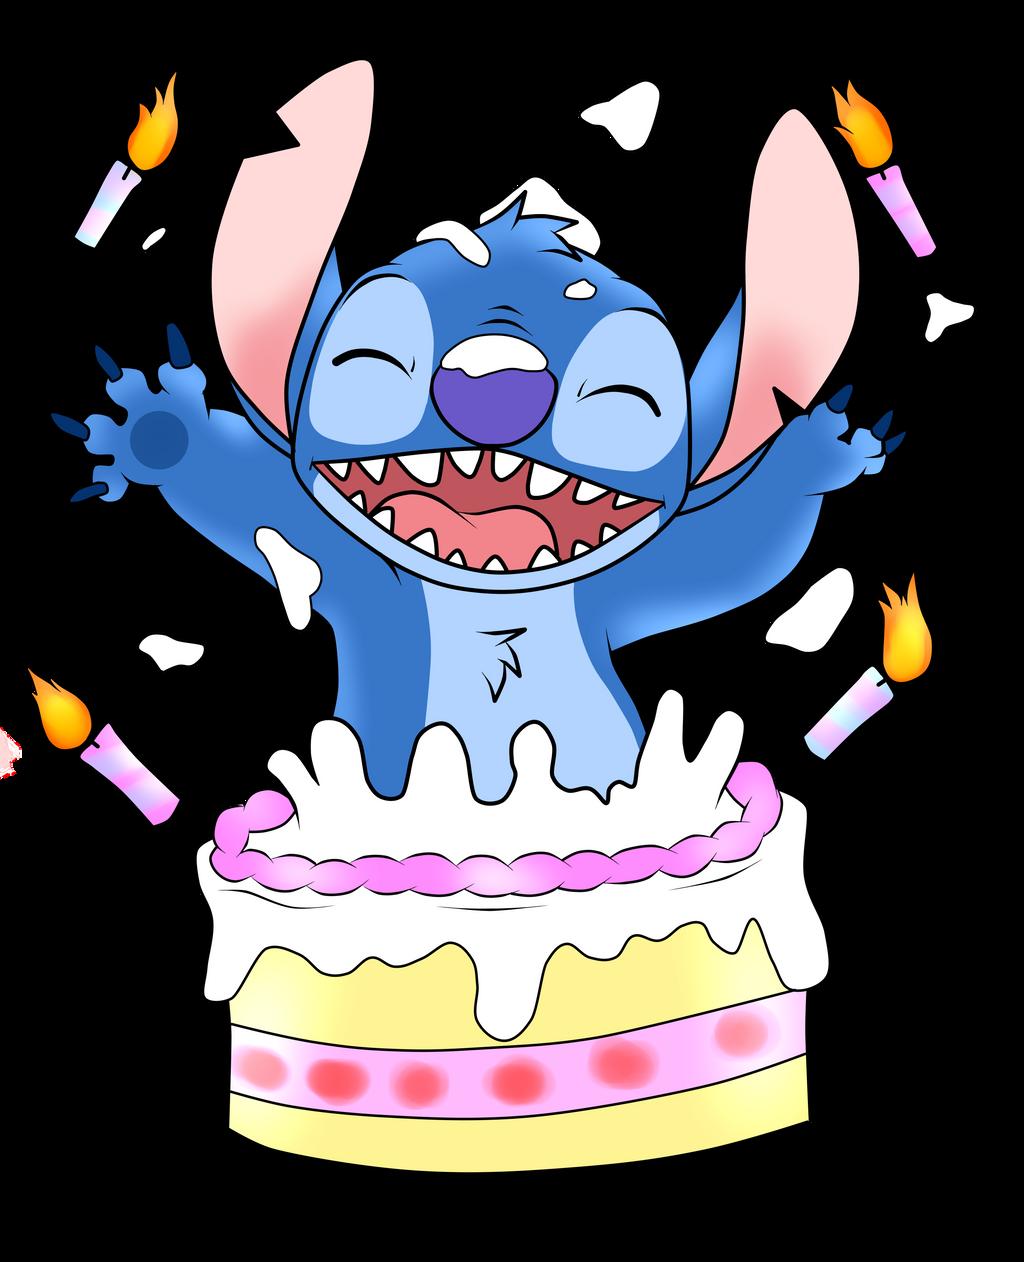 happy birthday 3d wallpaper cake